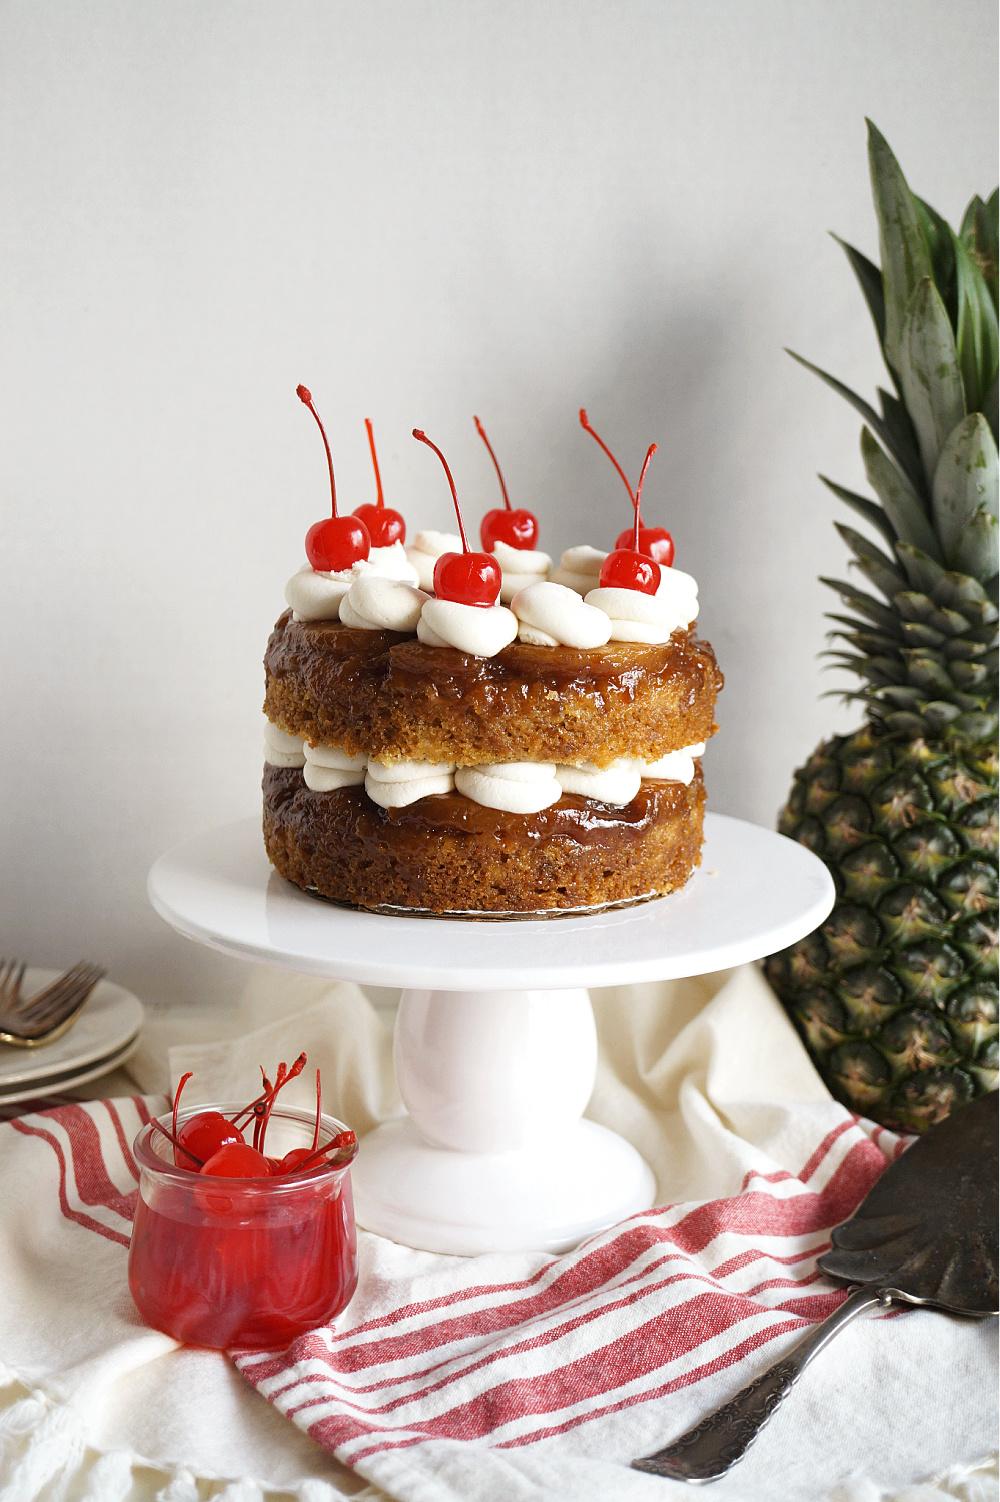 vegan pineapple upside down layer cake on cake stand